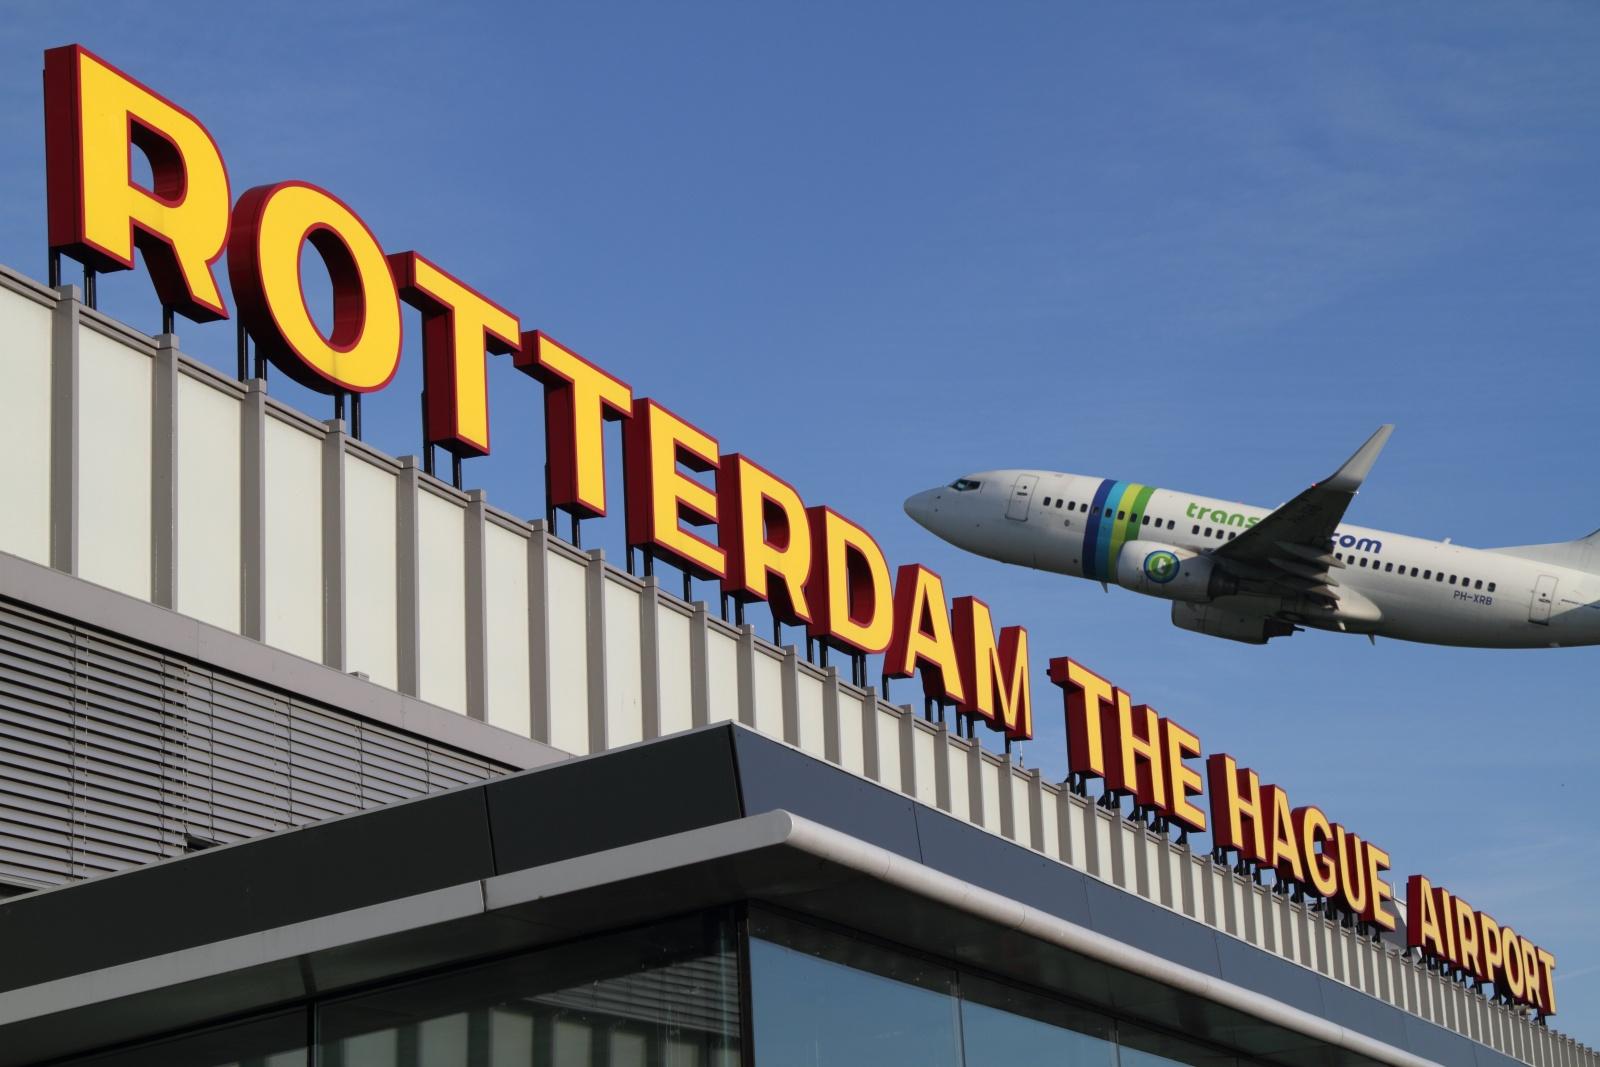 Website Rotterdam The Hague Airport onbereikbaar; vliegveld ontkent Turkse hack